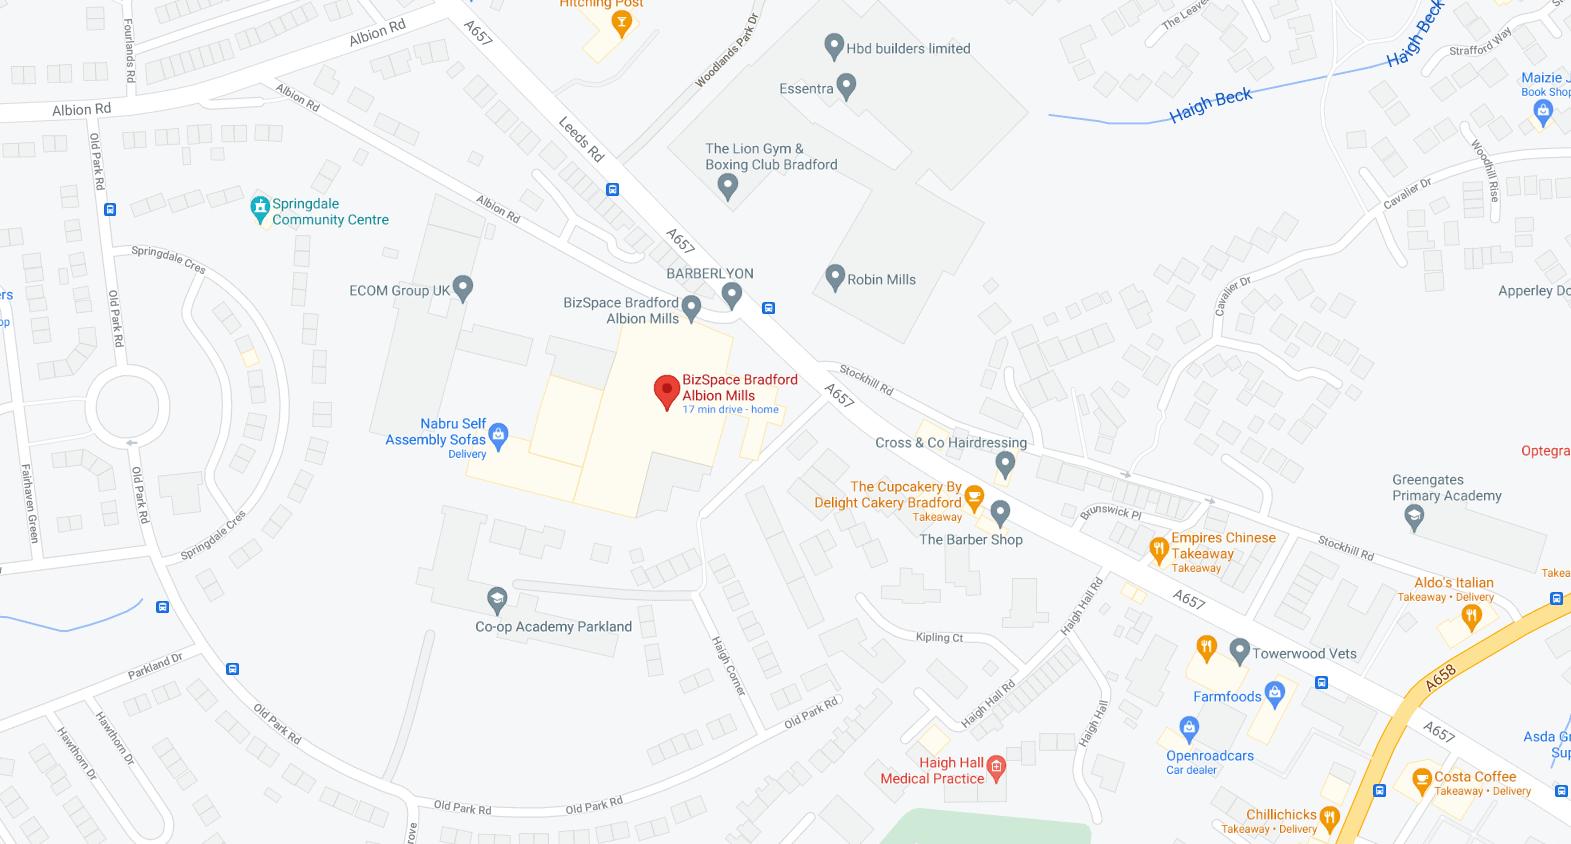 ART office location